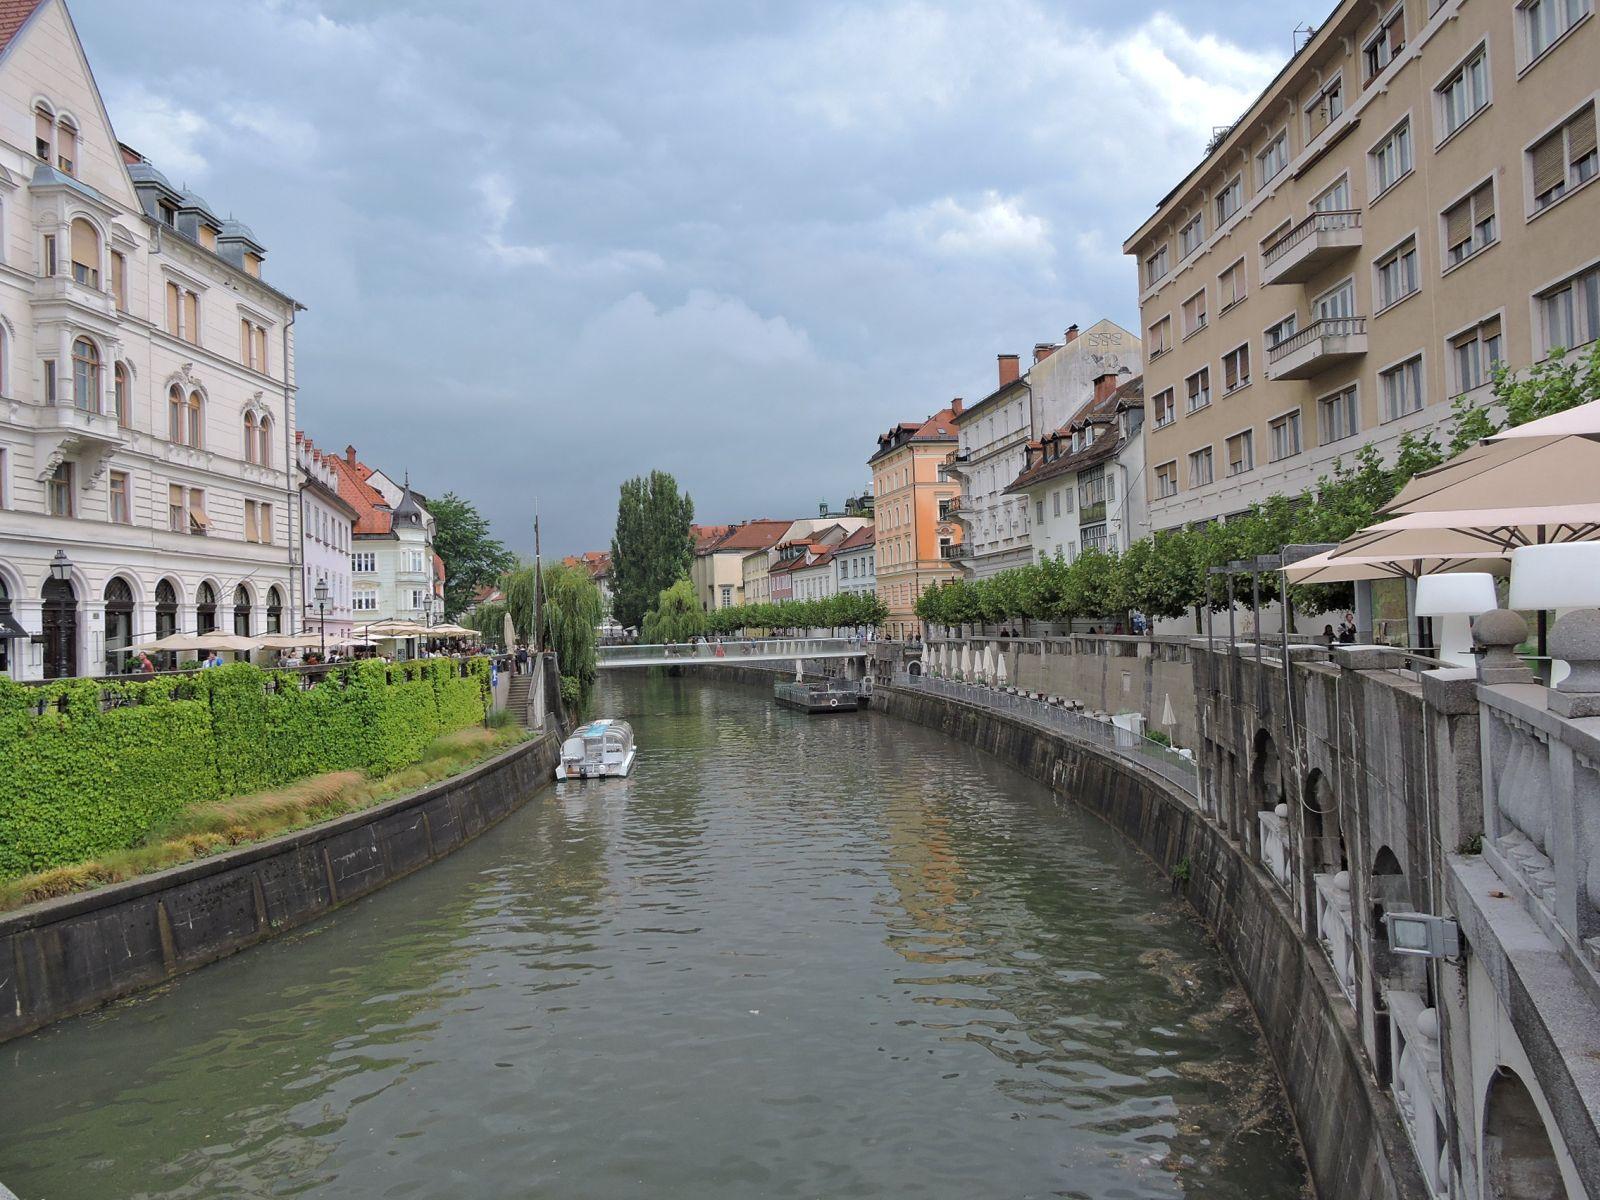 4_ljubljana_canal.JPG